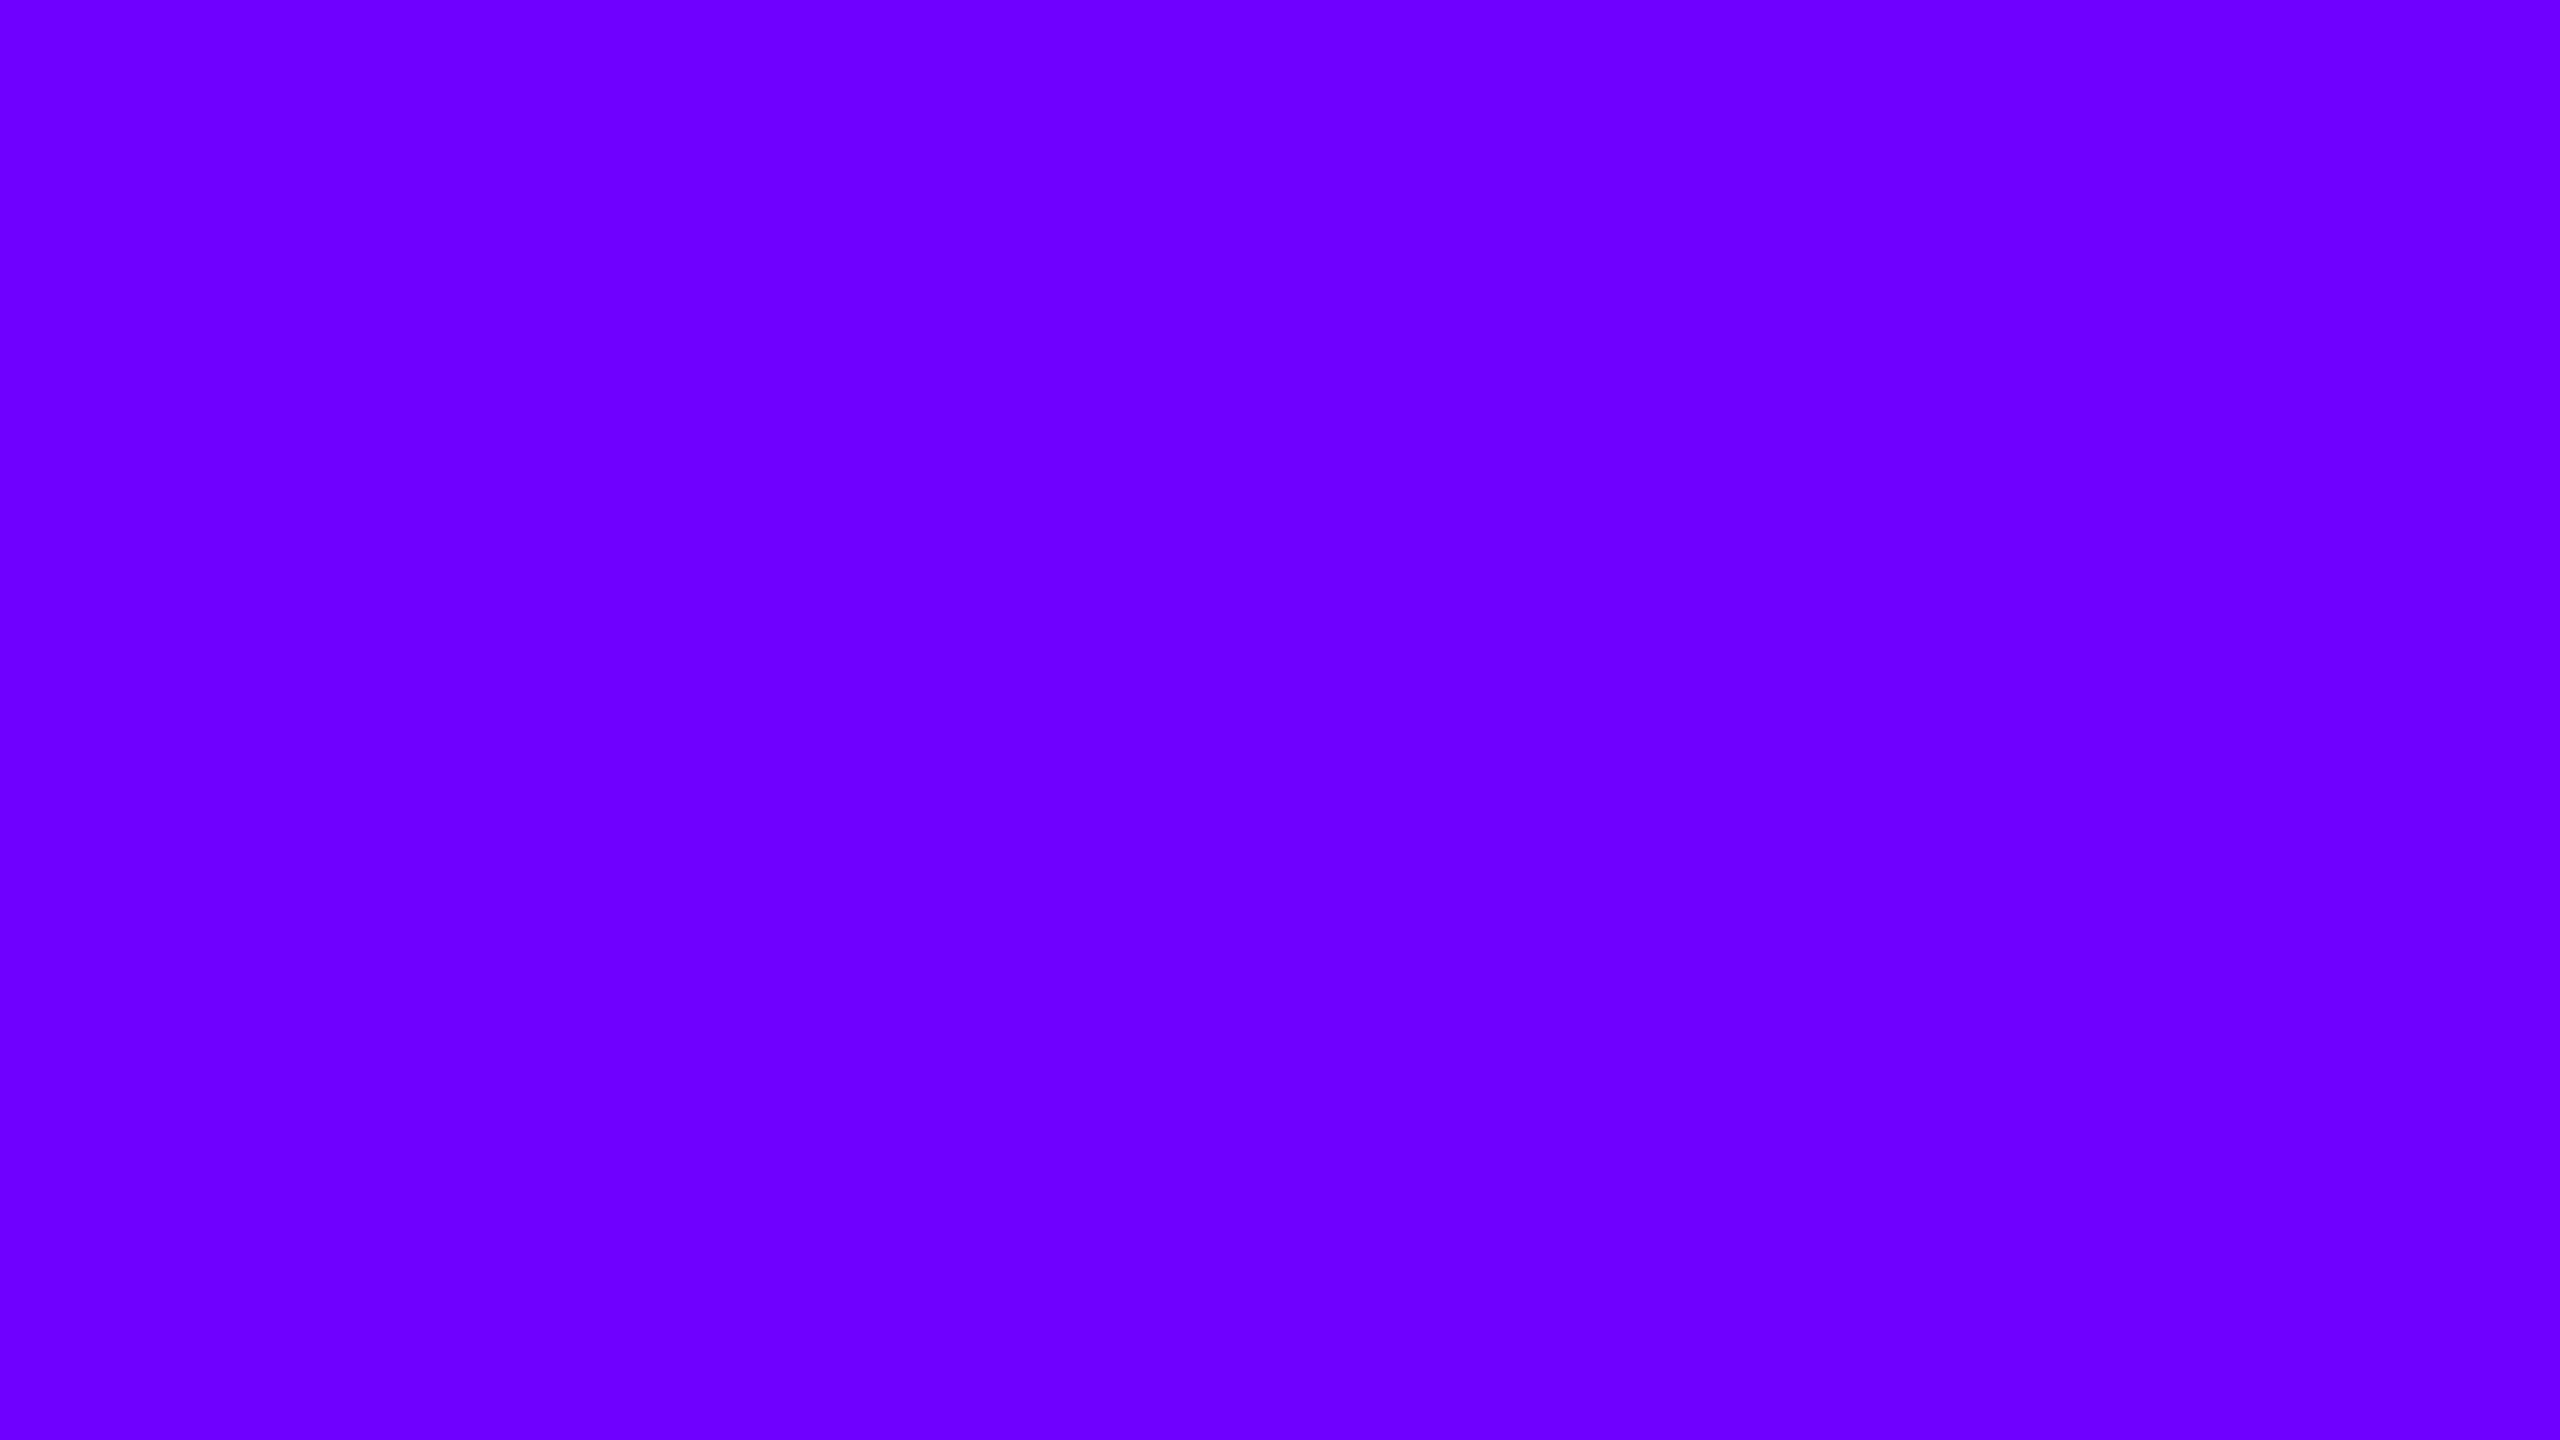 2560x1440 Electric Indigo Solid Color Background